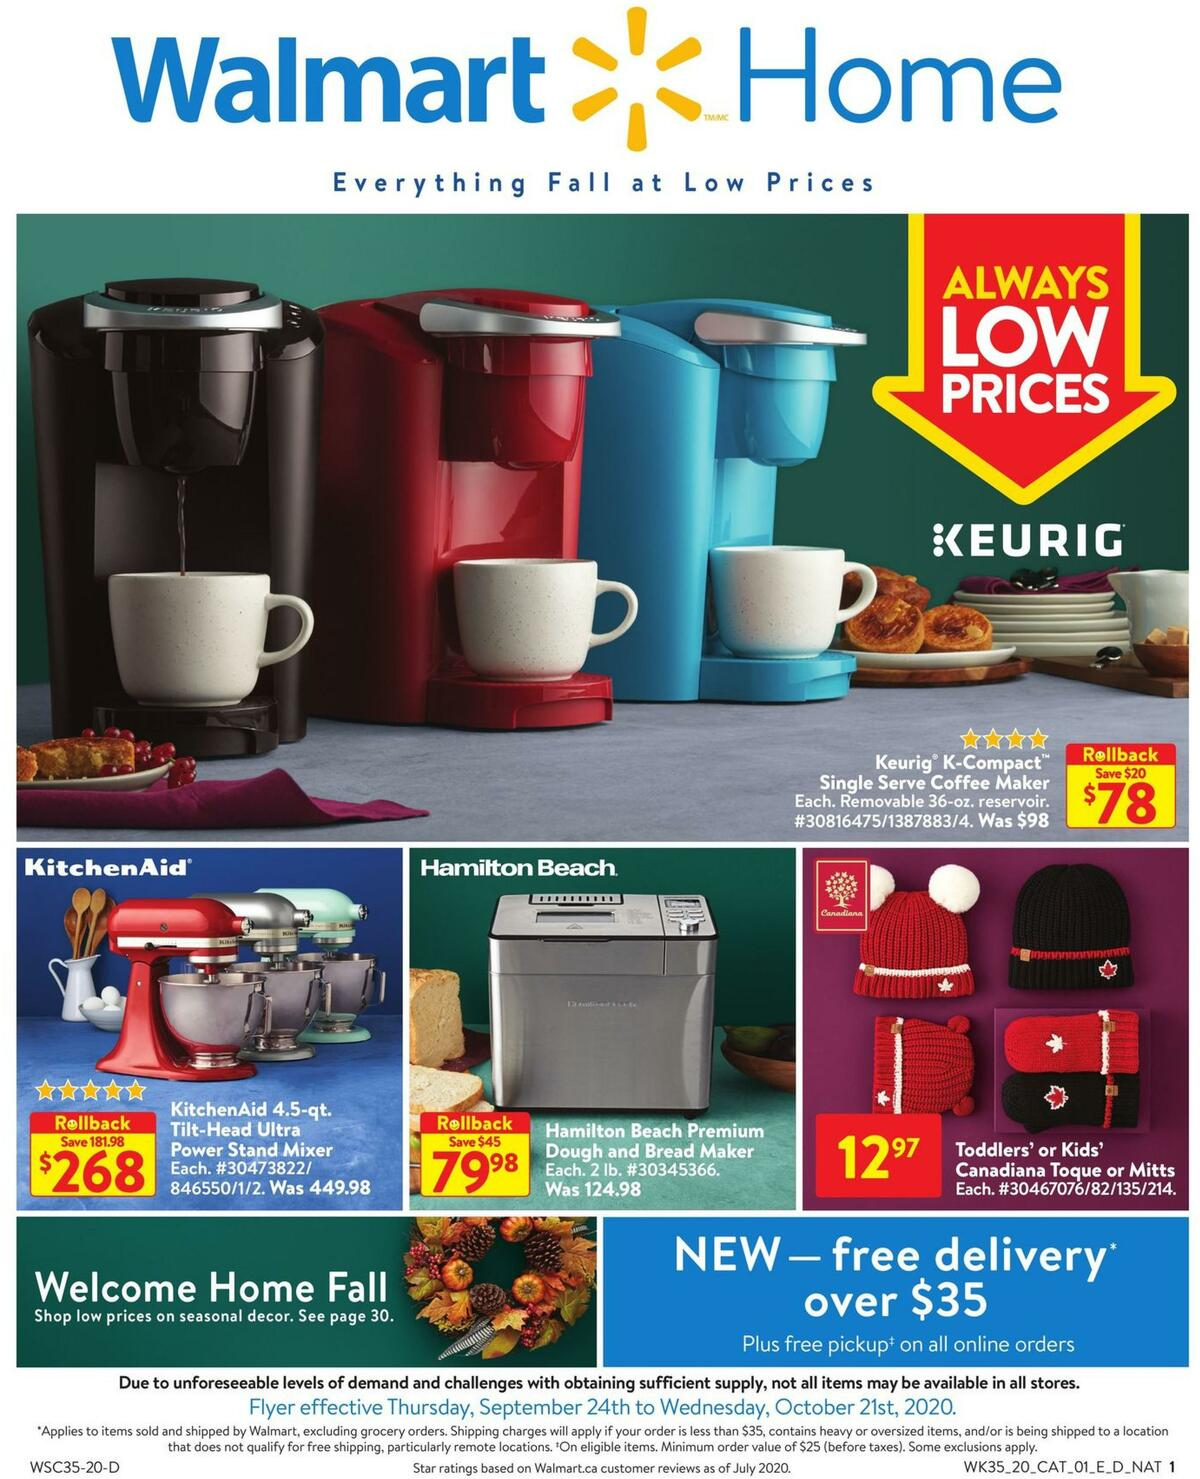 Walmart Home Flyer from September 24